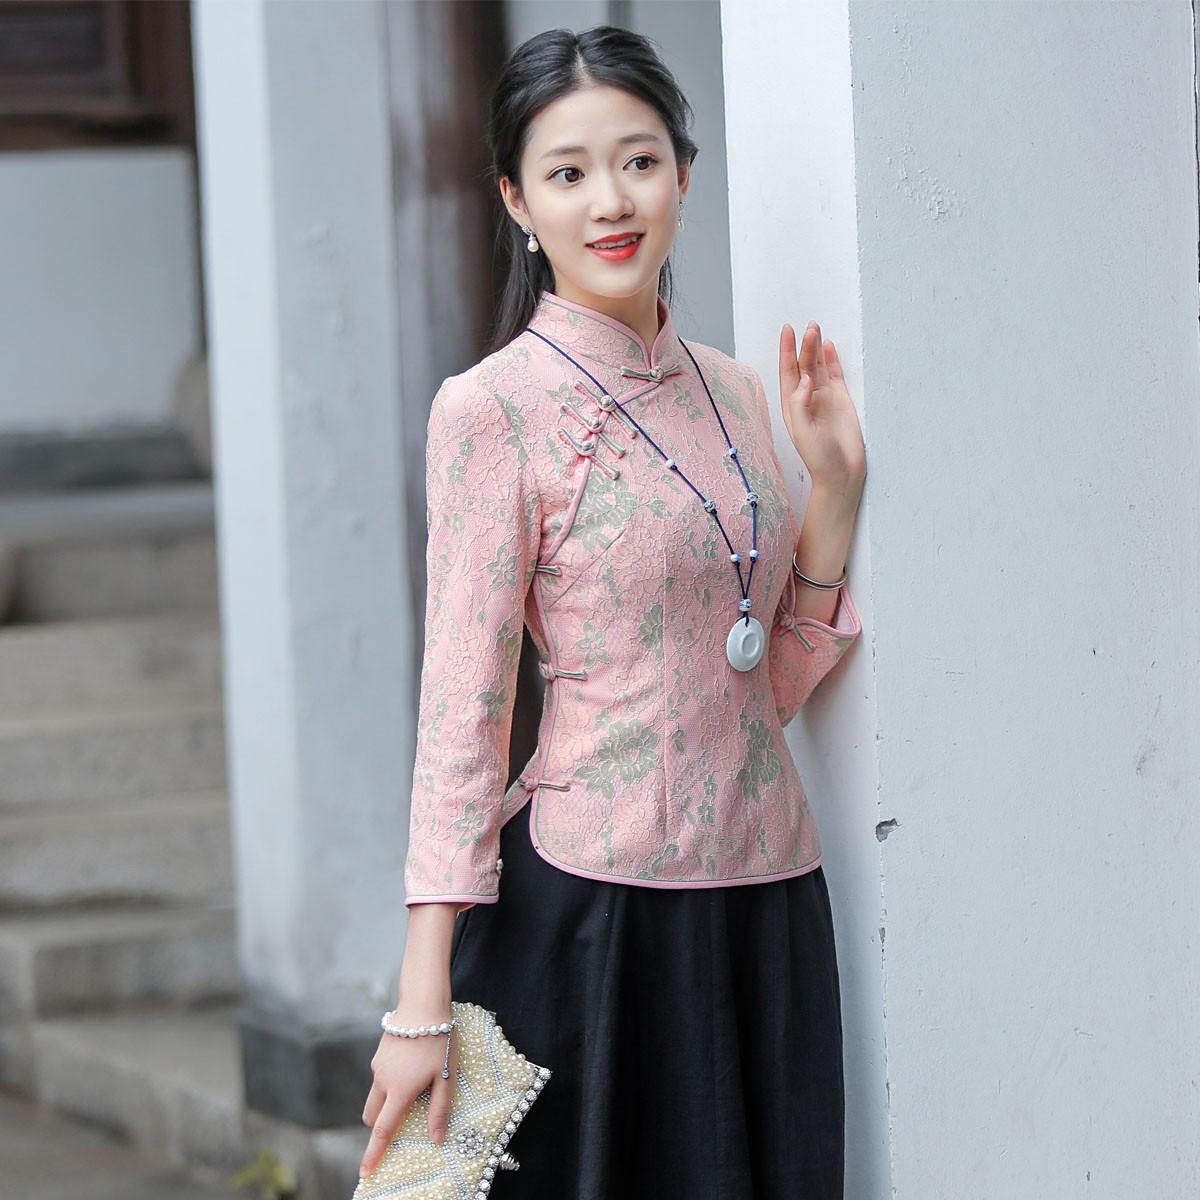 Delightful Pink Lace Qipao Cheongsam Chinese Shirt